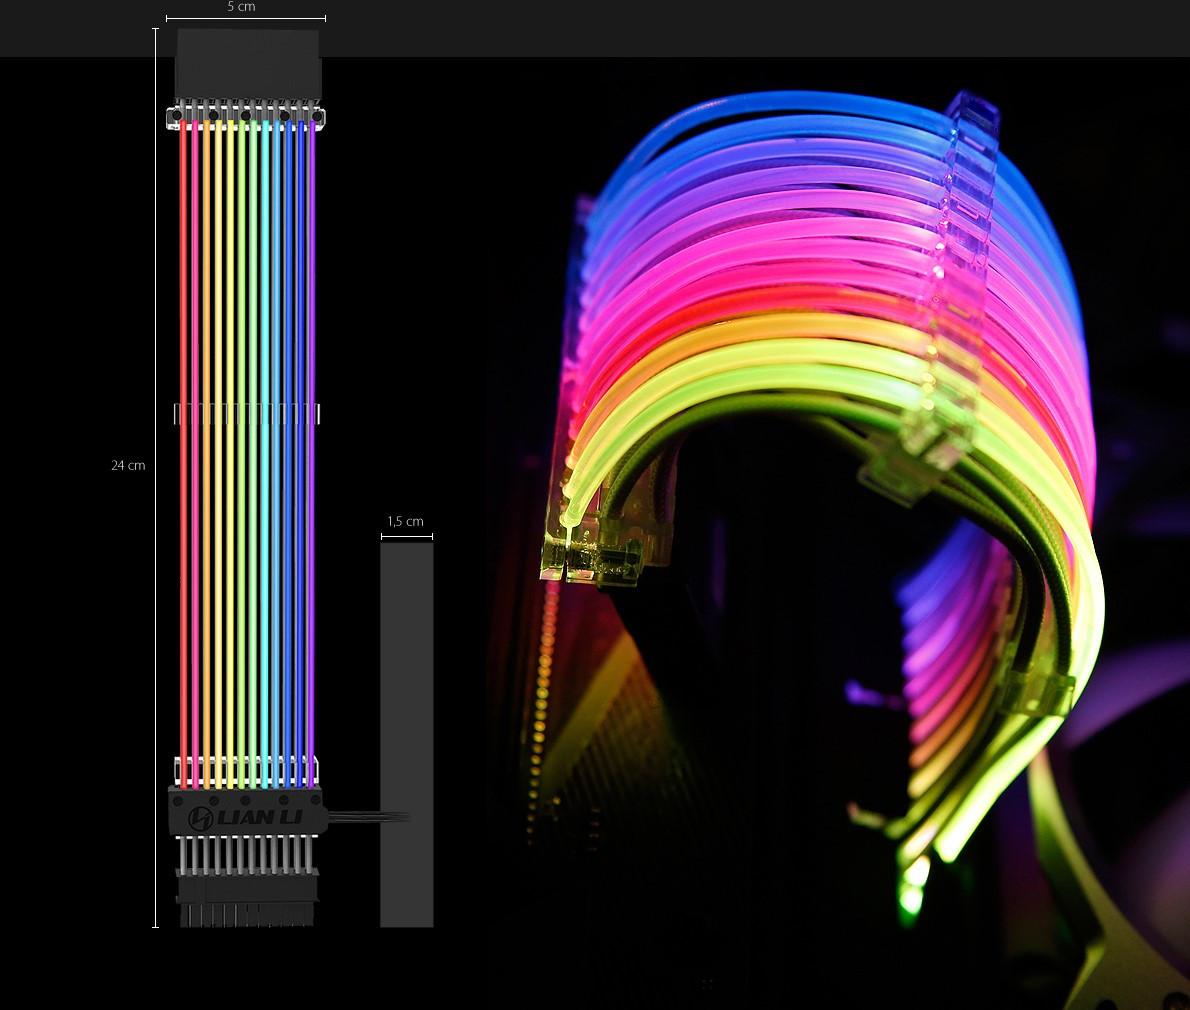 wccftech-lian-li-rgb-cables-2